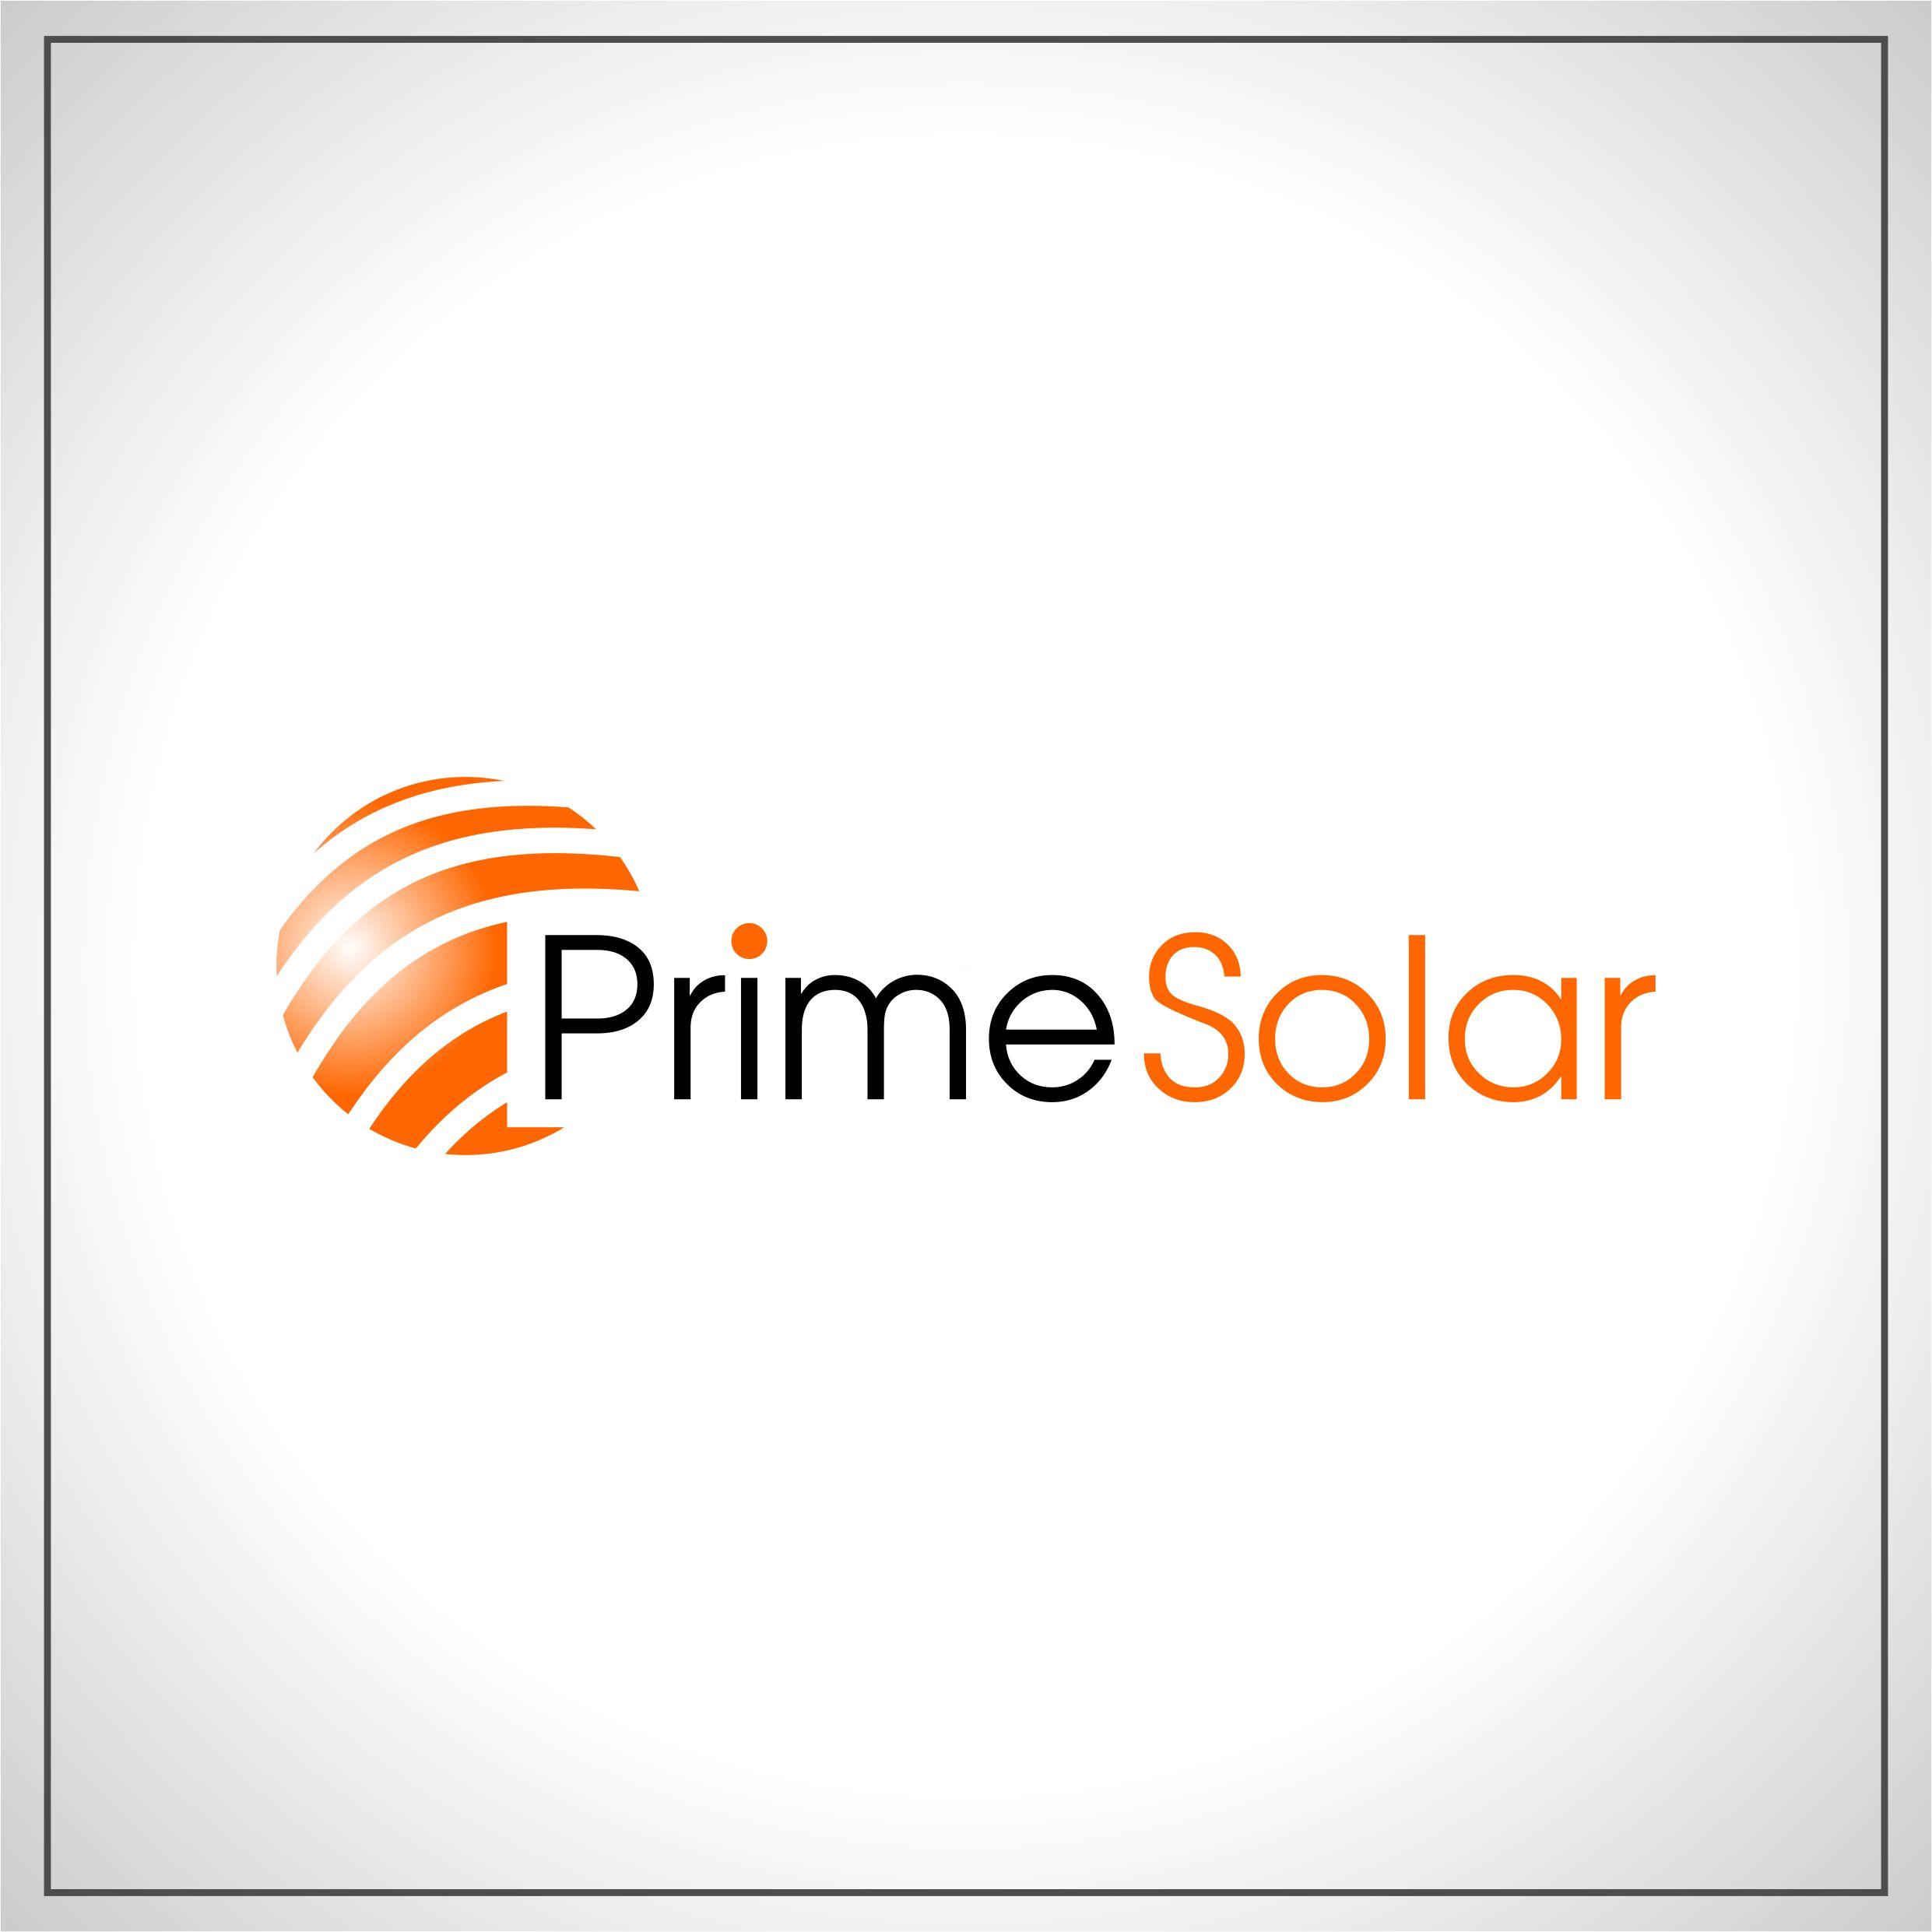 Логотип компании PrimeSolar [UPD: 16:45 15/12/11] фото f_4eef18531c05e.jpg